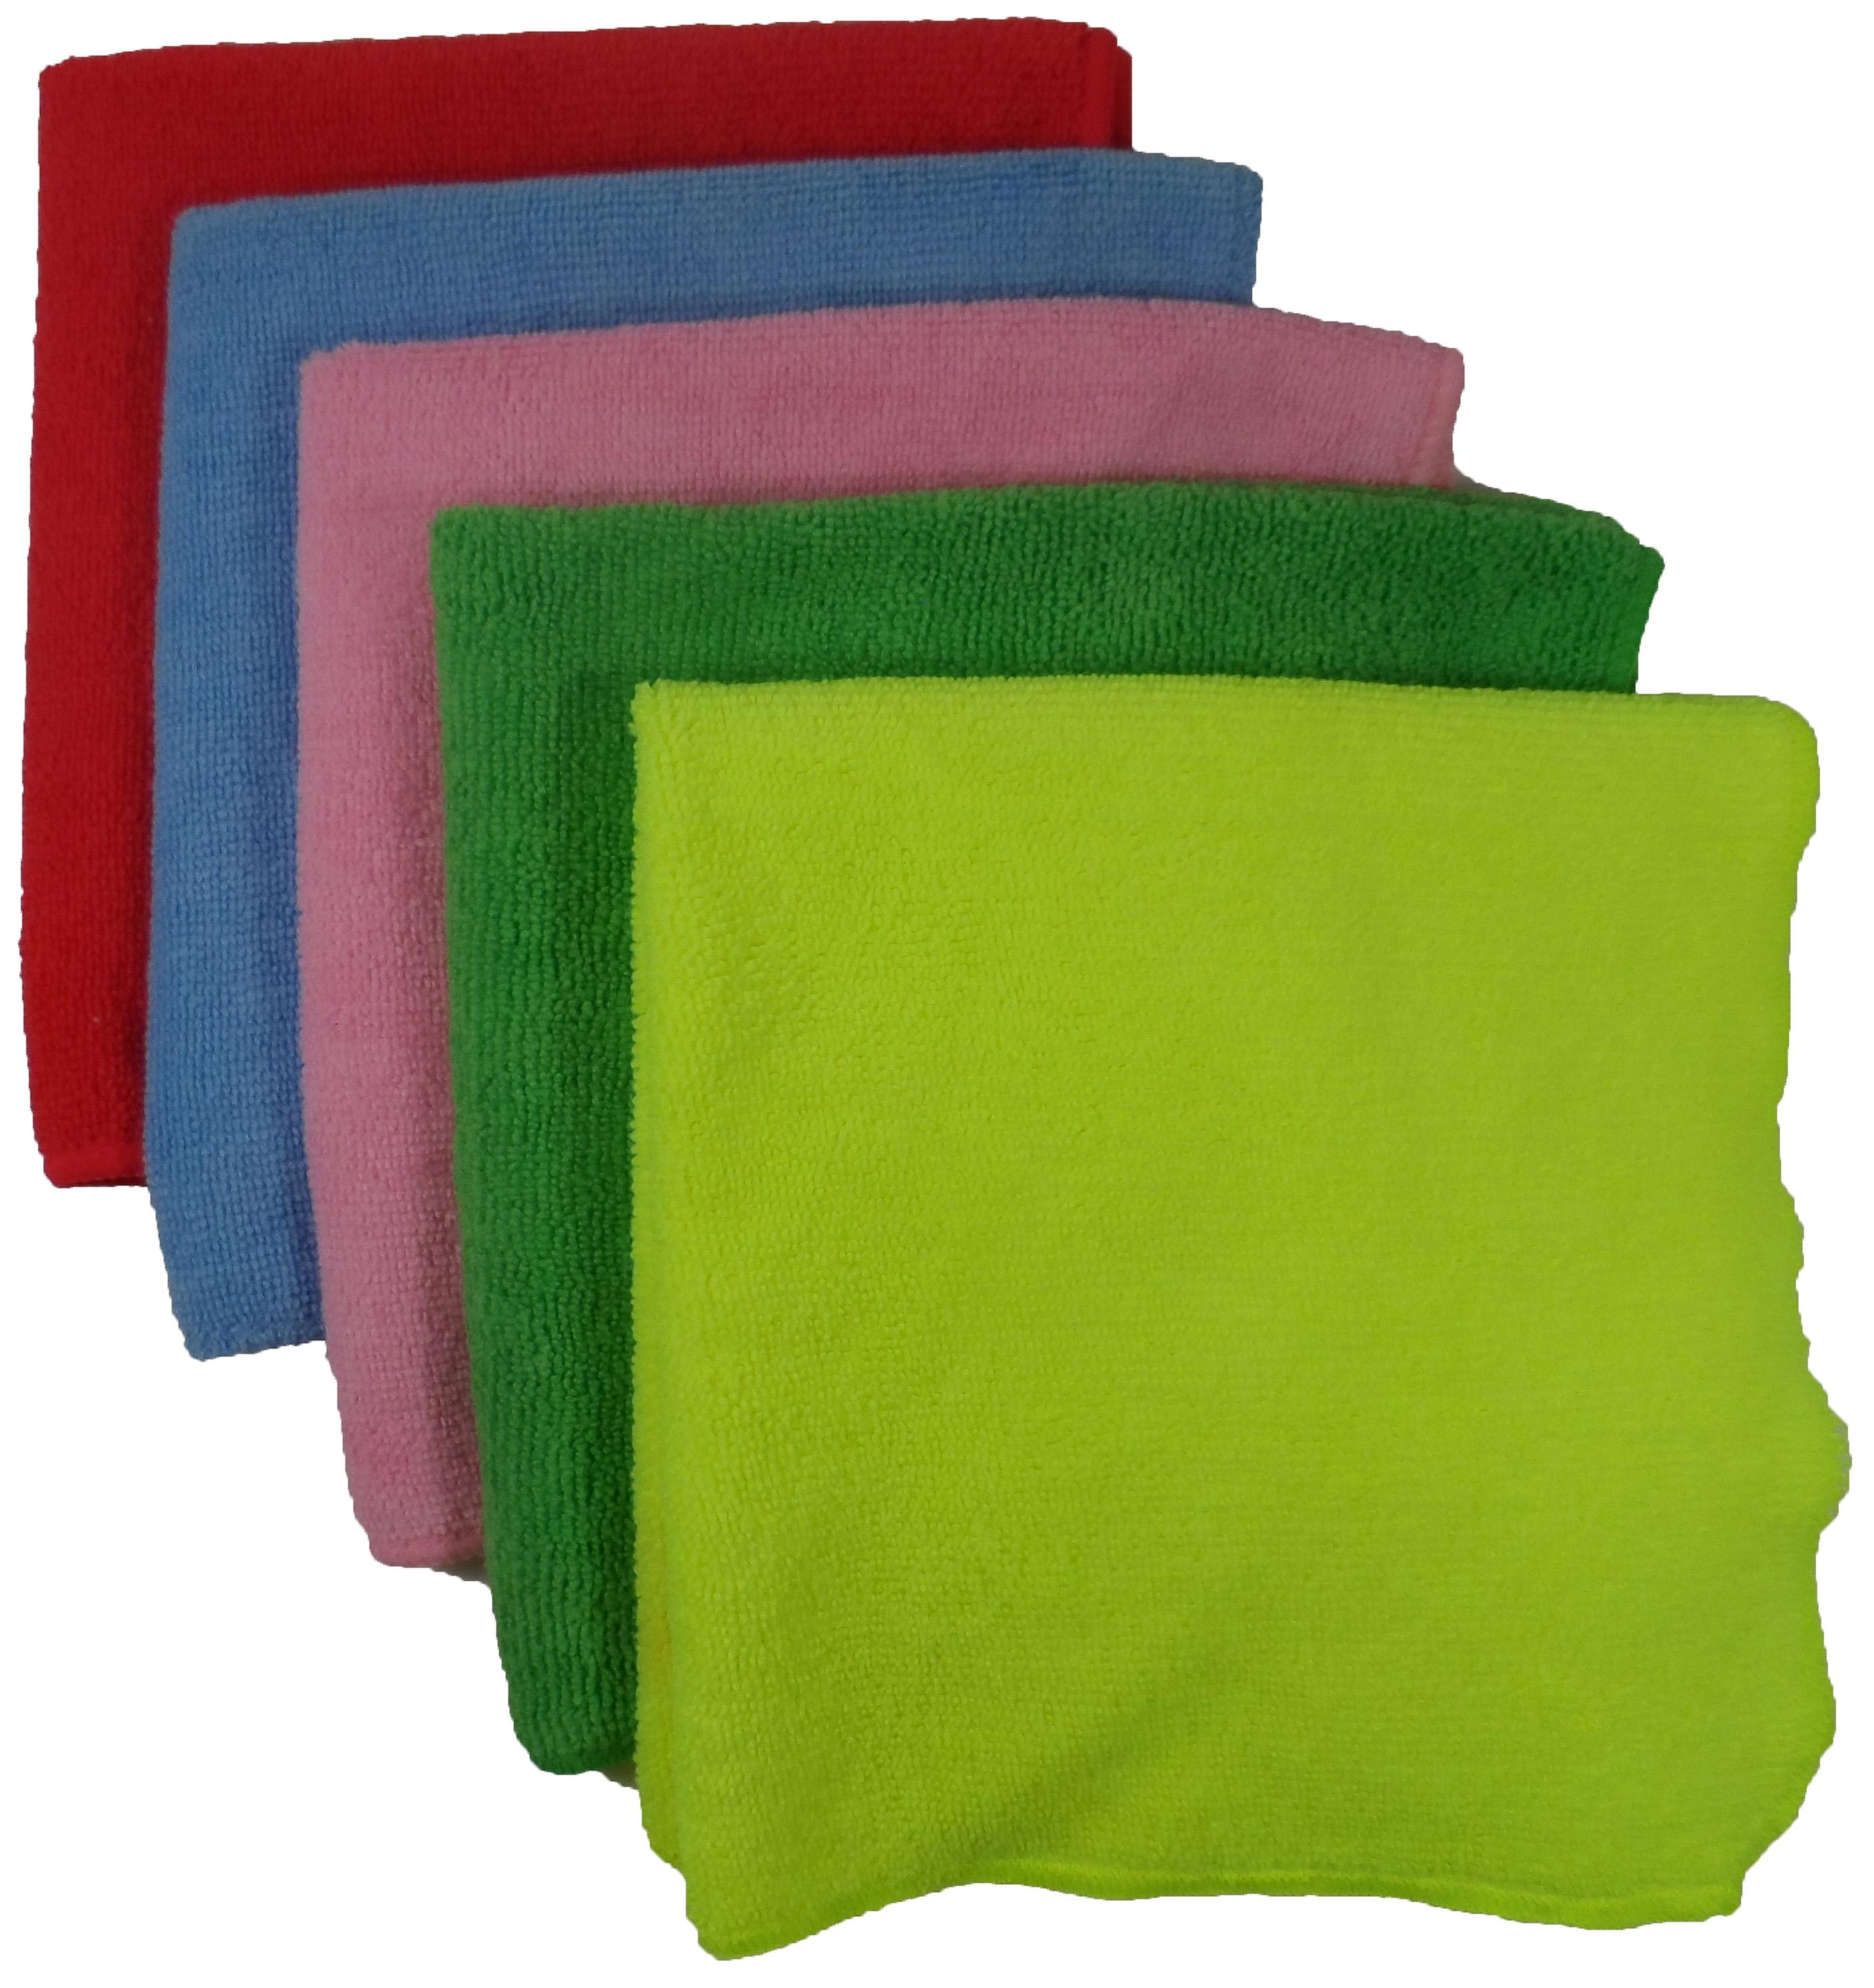 Microfiber Cloth Dusting: Better Brush ProductsMicrofiber Dusting Cloths